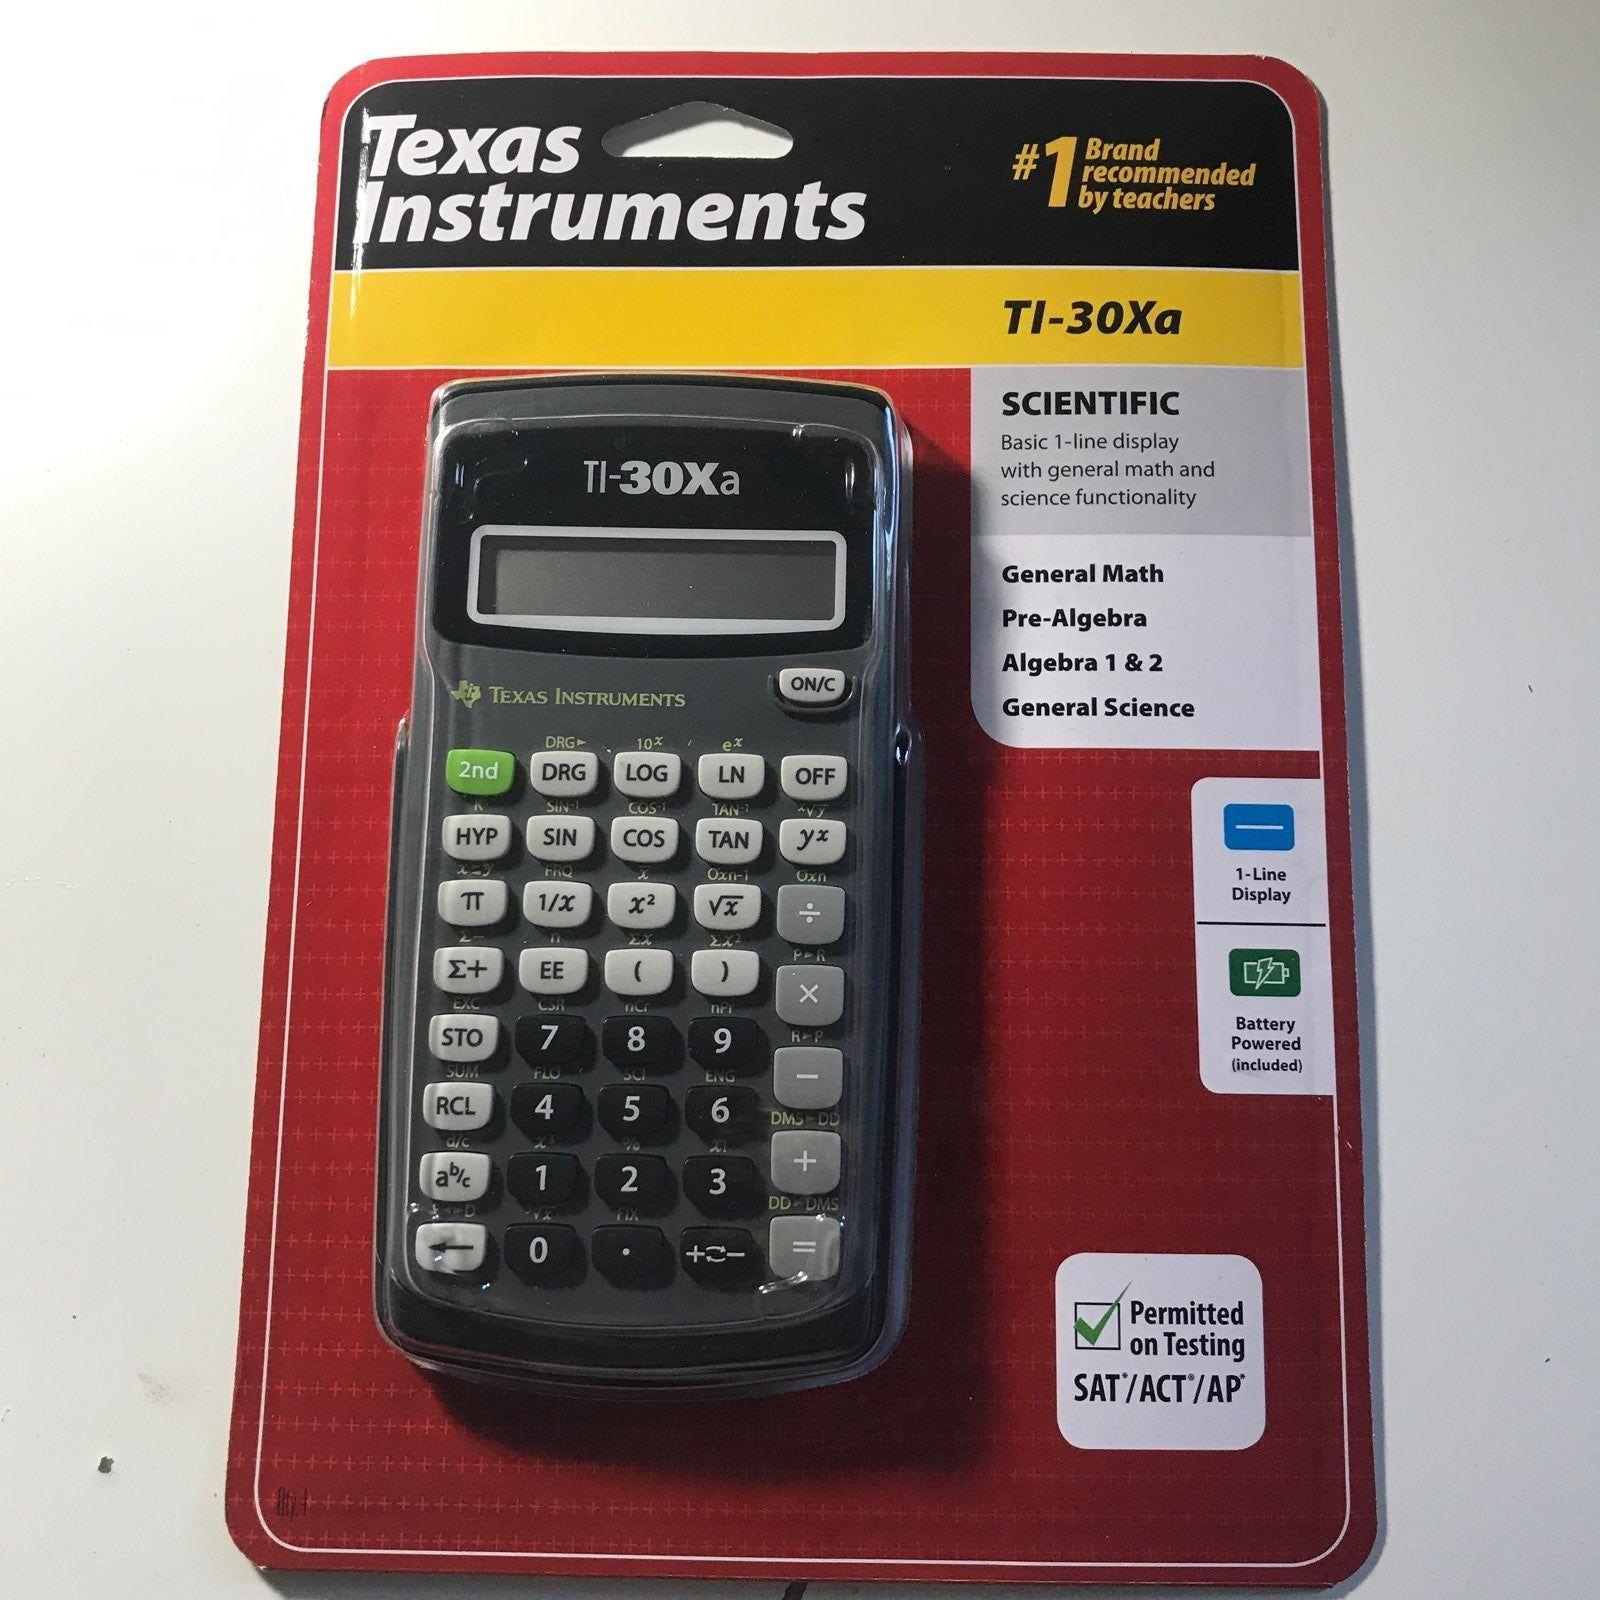 NEW Texas Instruments TI-30Xa Scientific Calculator